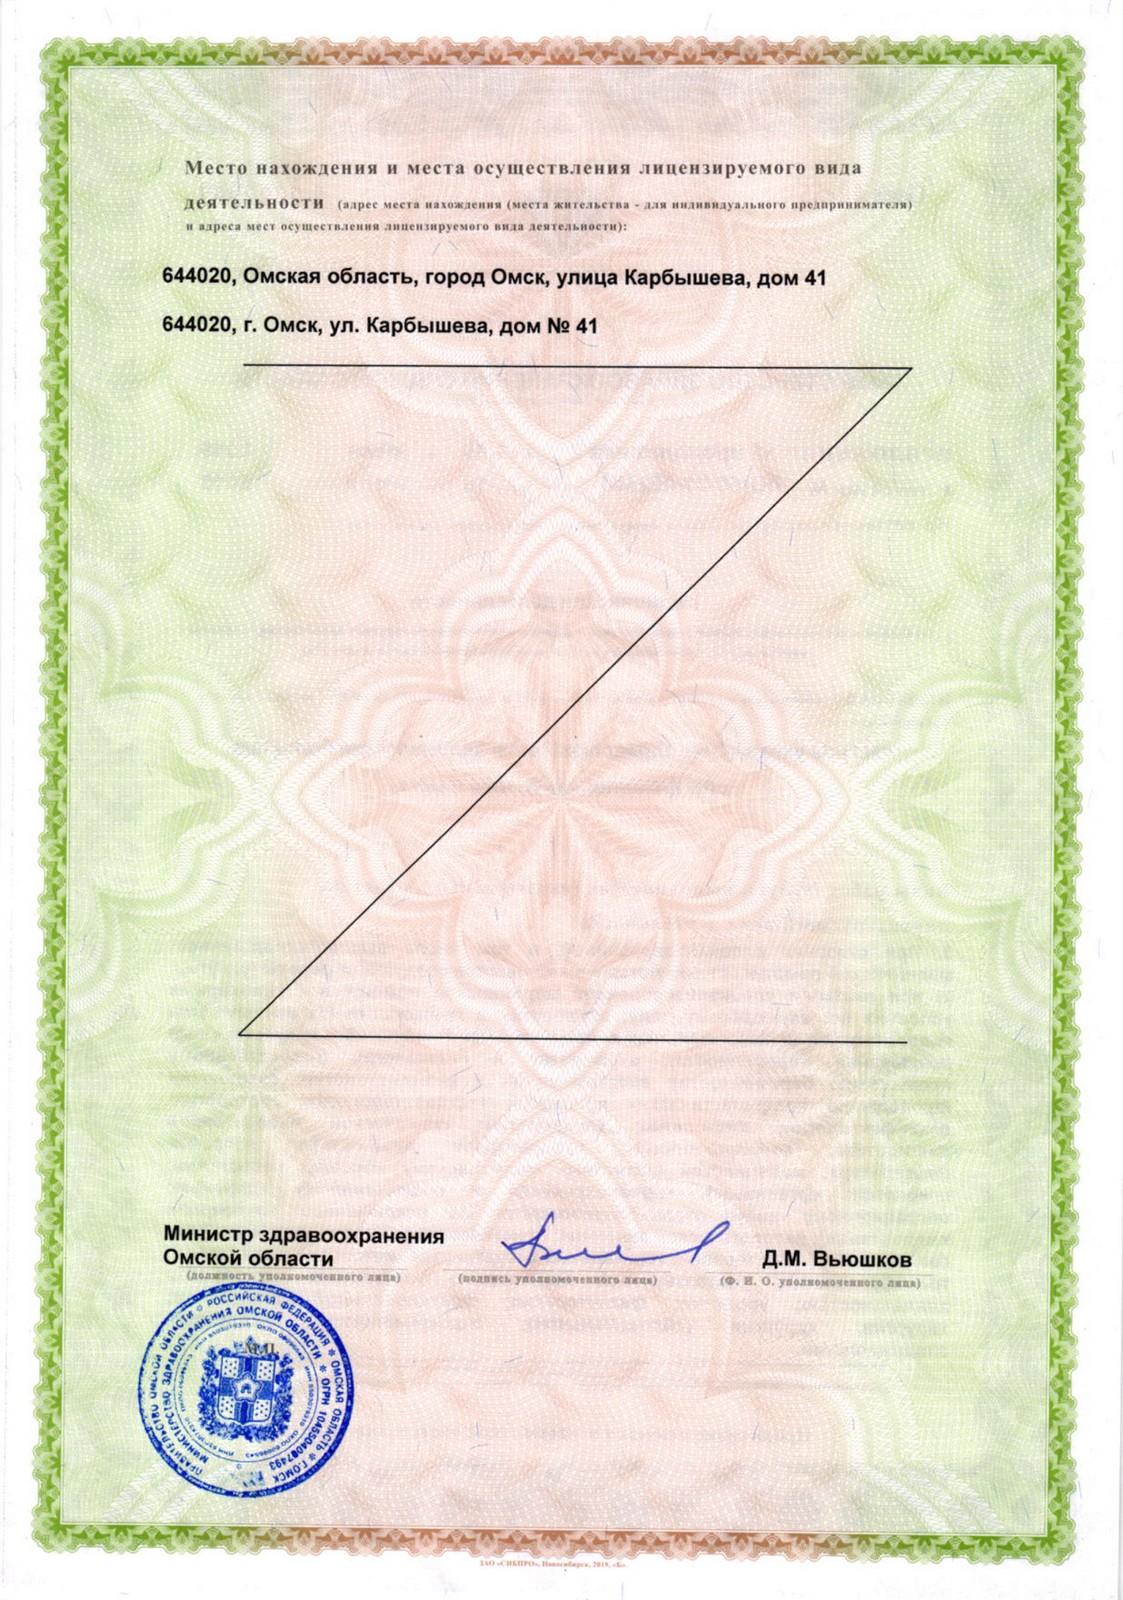 License-2019-07-18_16